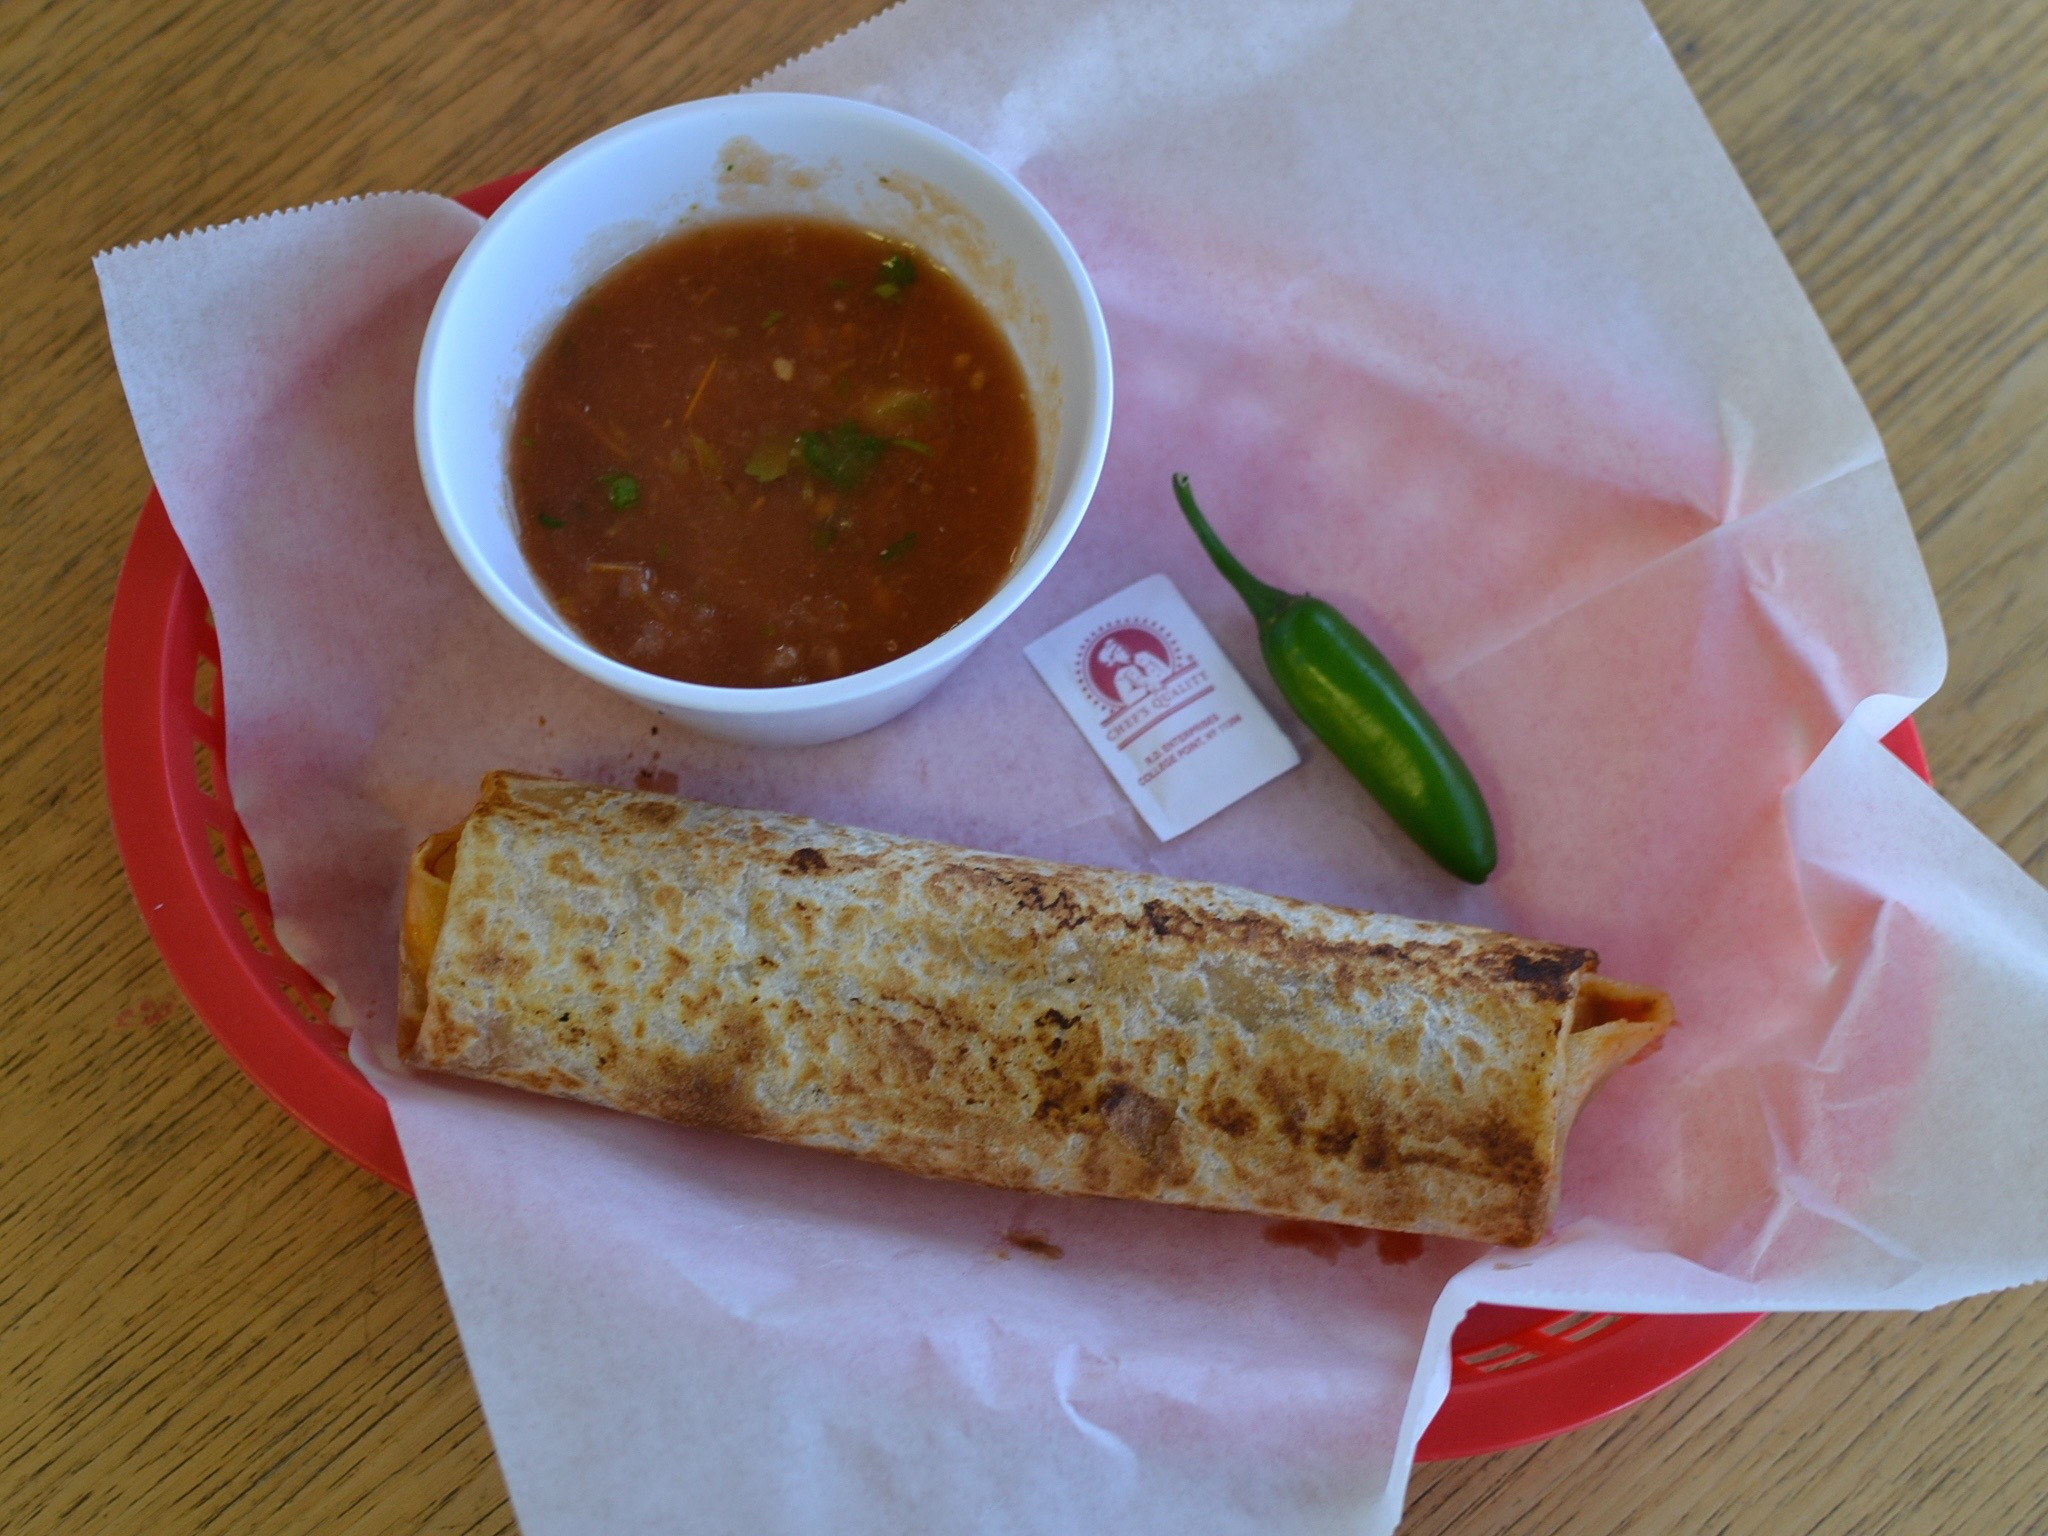 Burrito Los Angeles